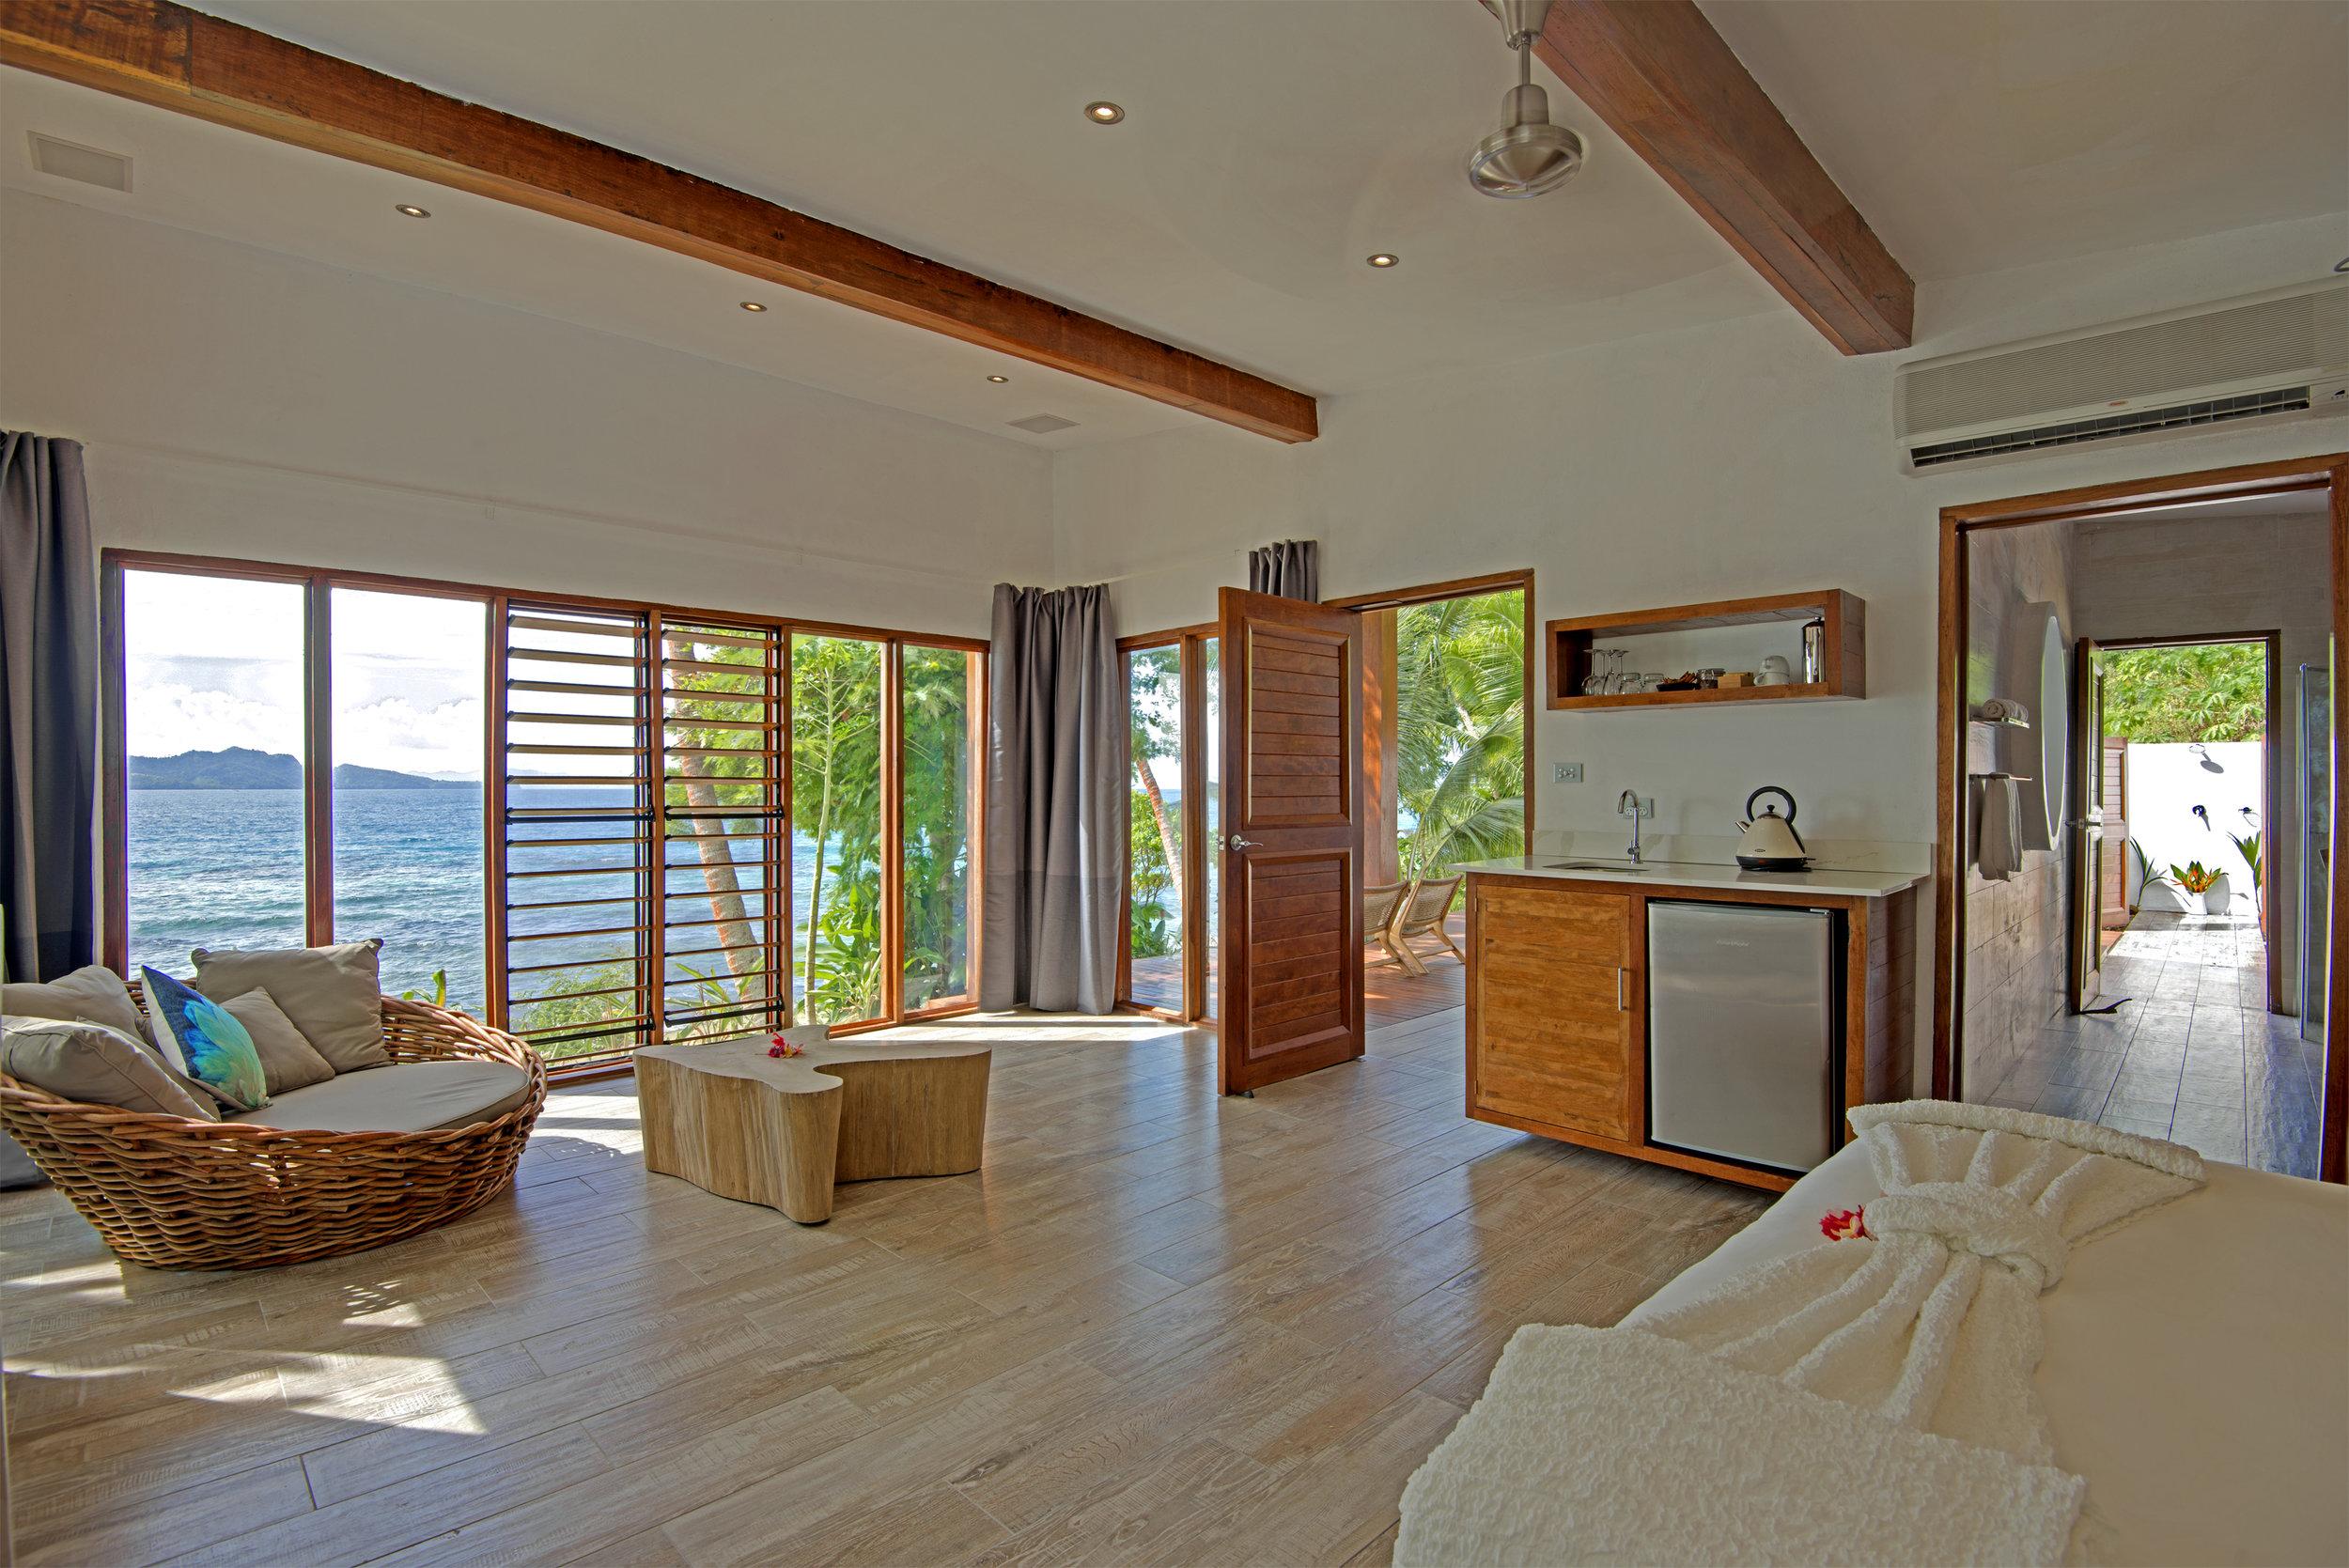 Royal Retreat - Spacious lounge, bedroom and bathroom